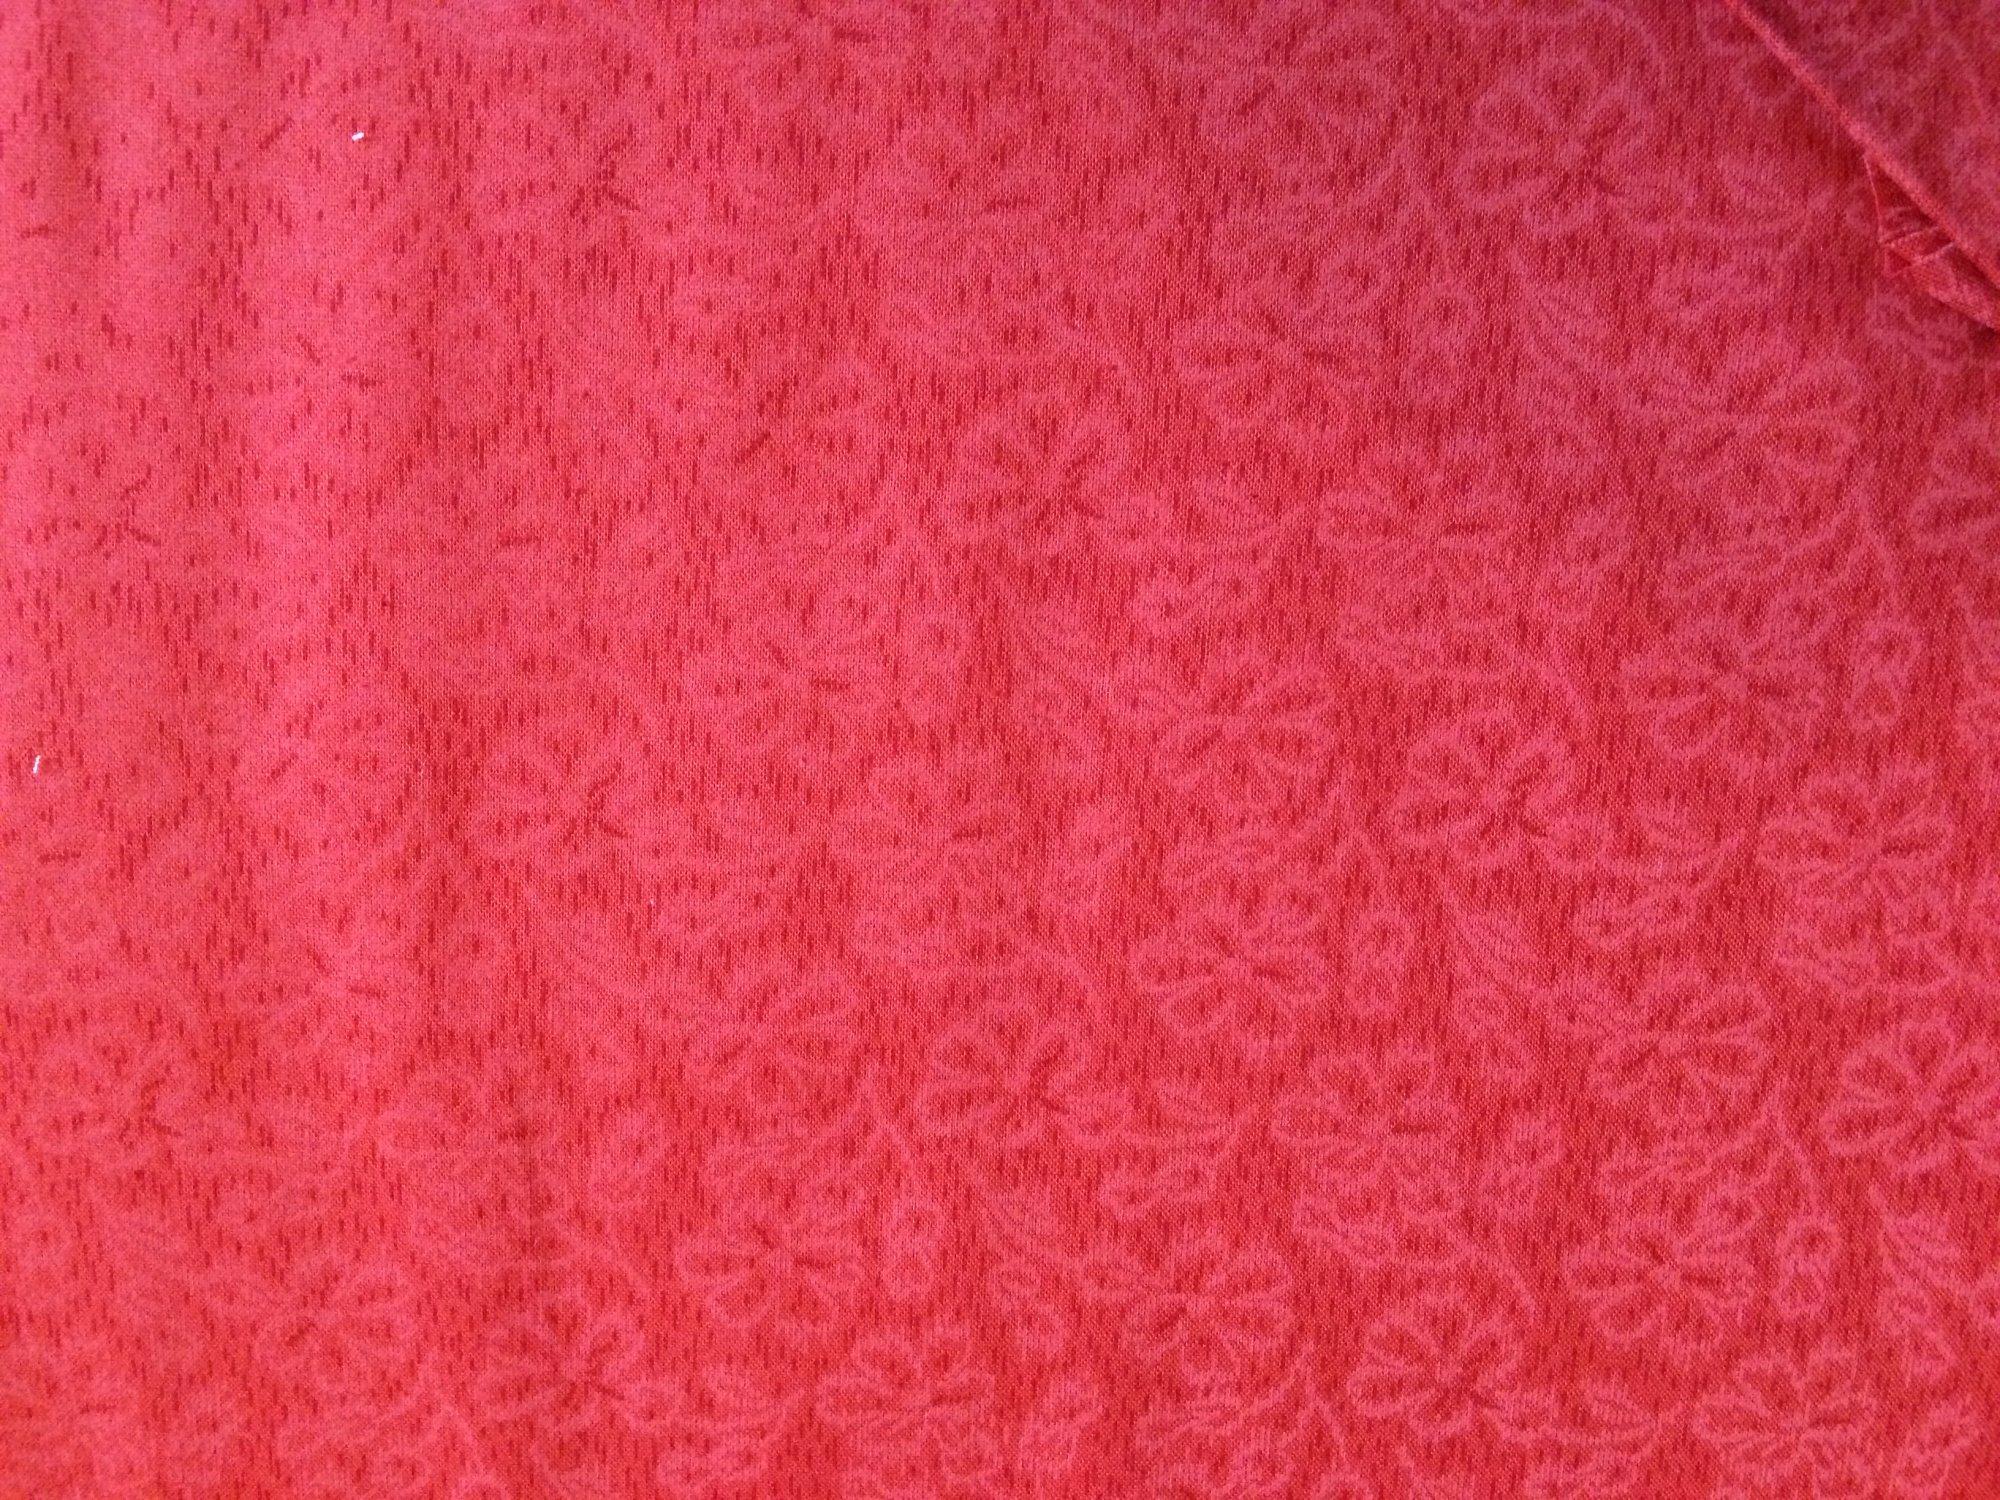 New Basics - Red tone on tone - P&B Textile  NBAS #12 RO